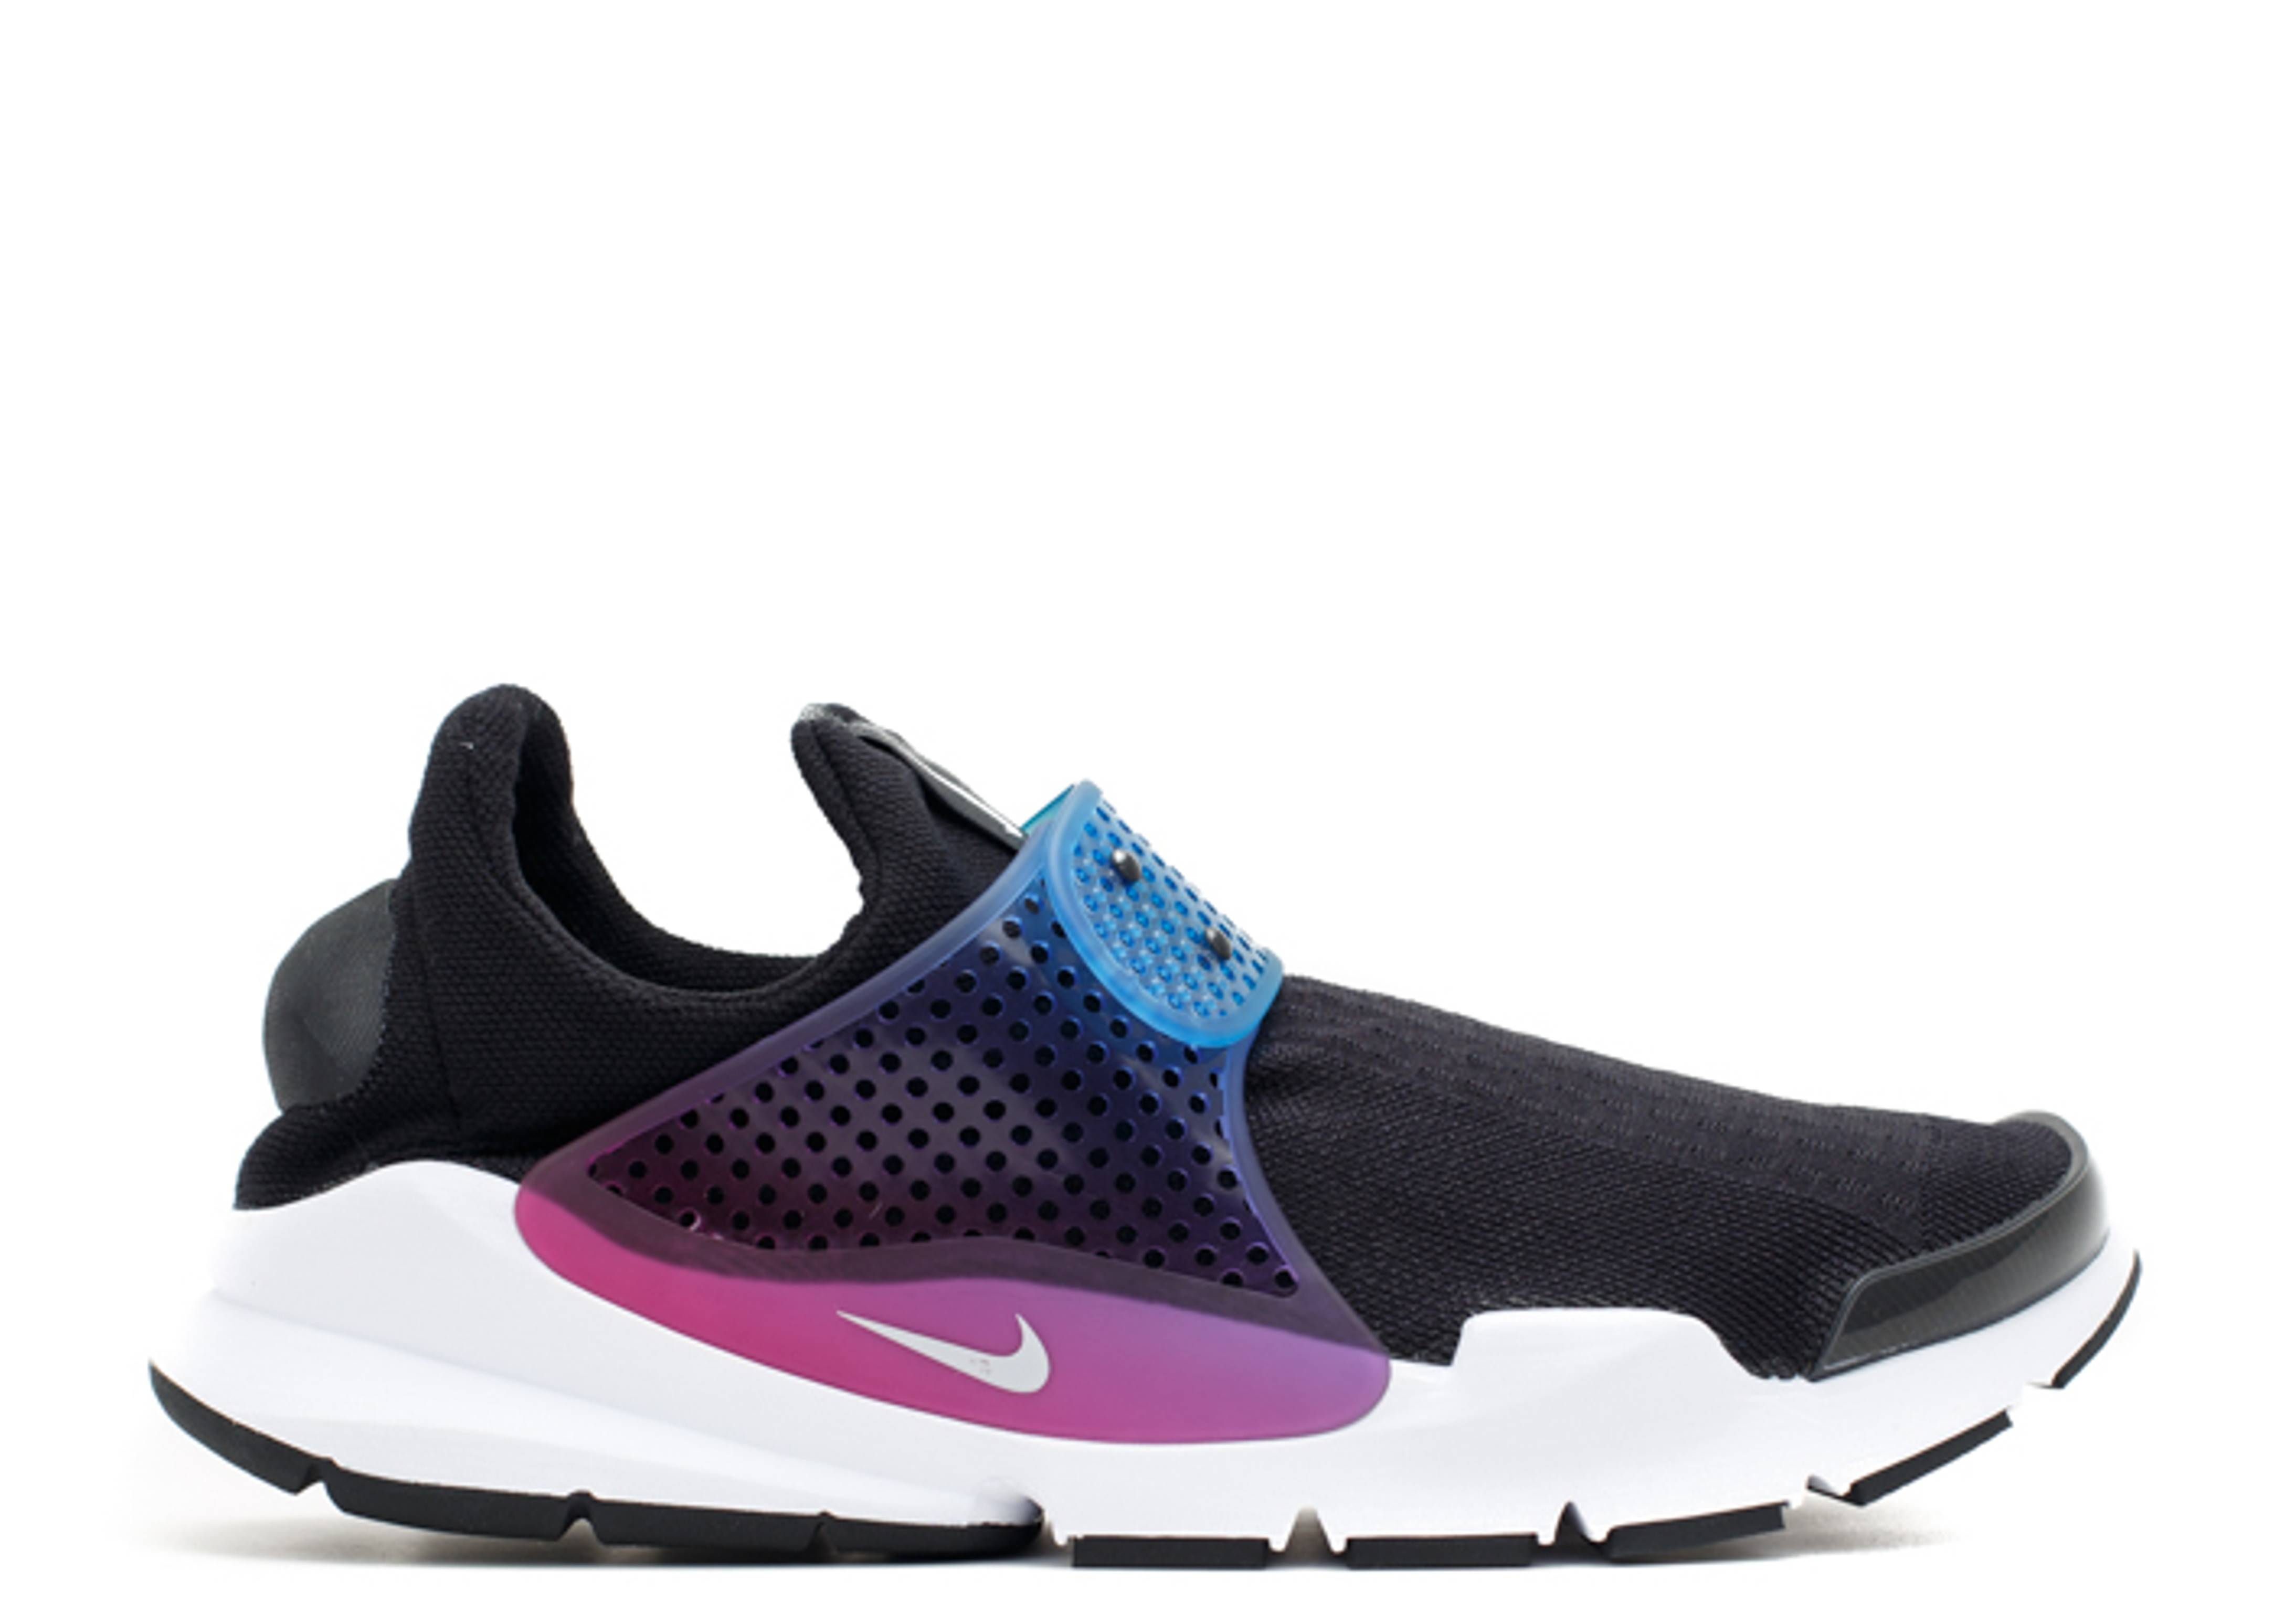 Nike Sock Dart Independence Day White Trainer Size 5.5 UK